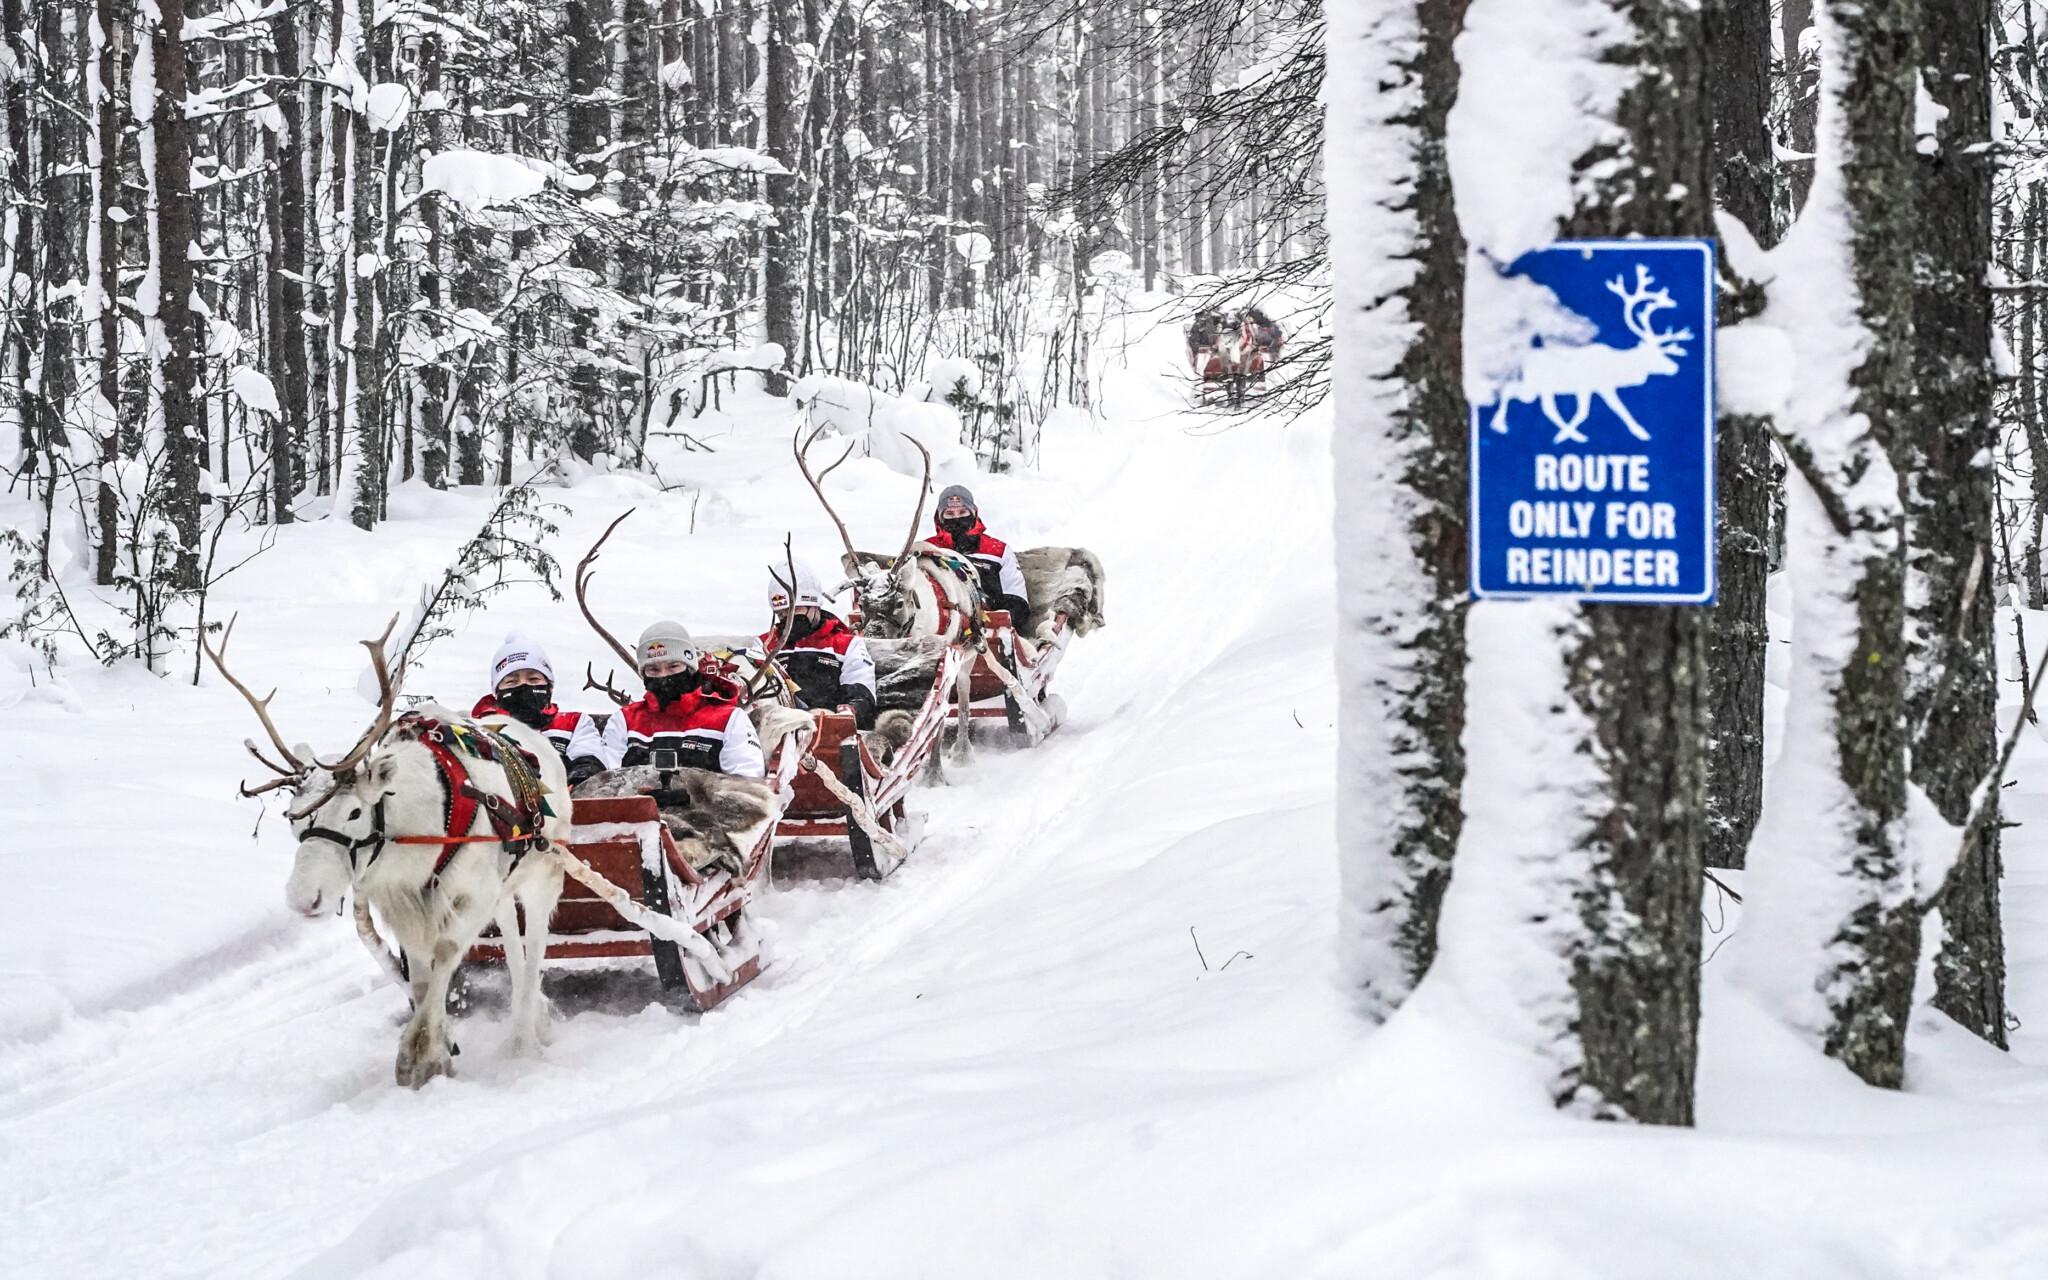 Arctic Rally Finland The Rally teams day in Santa Claus Village